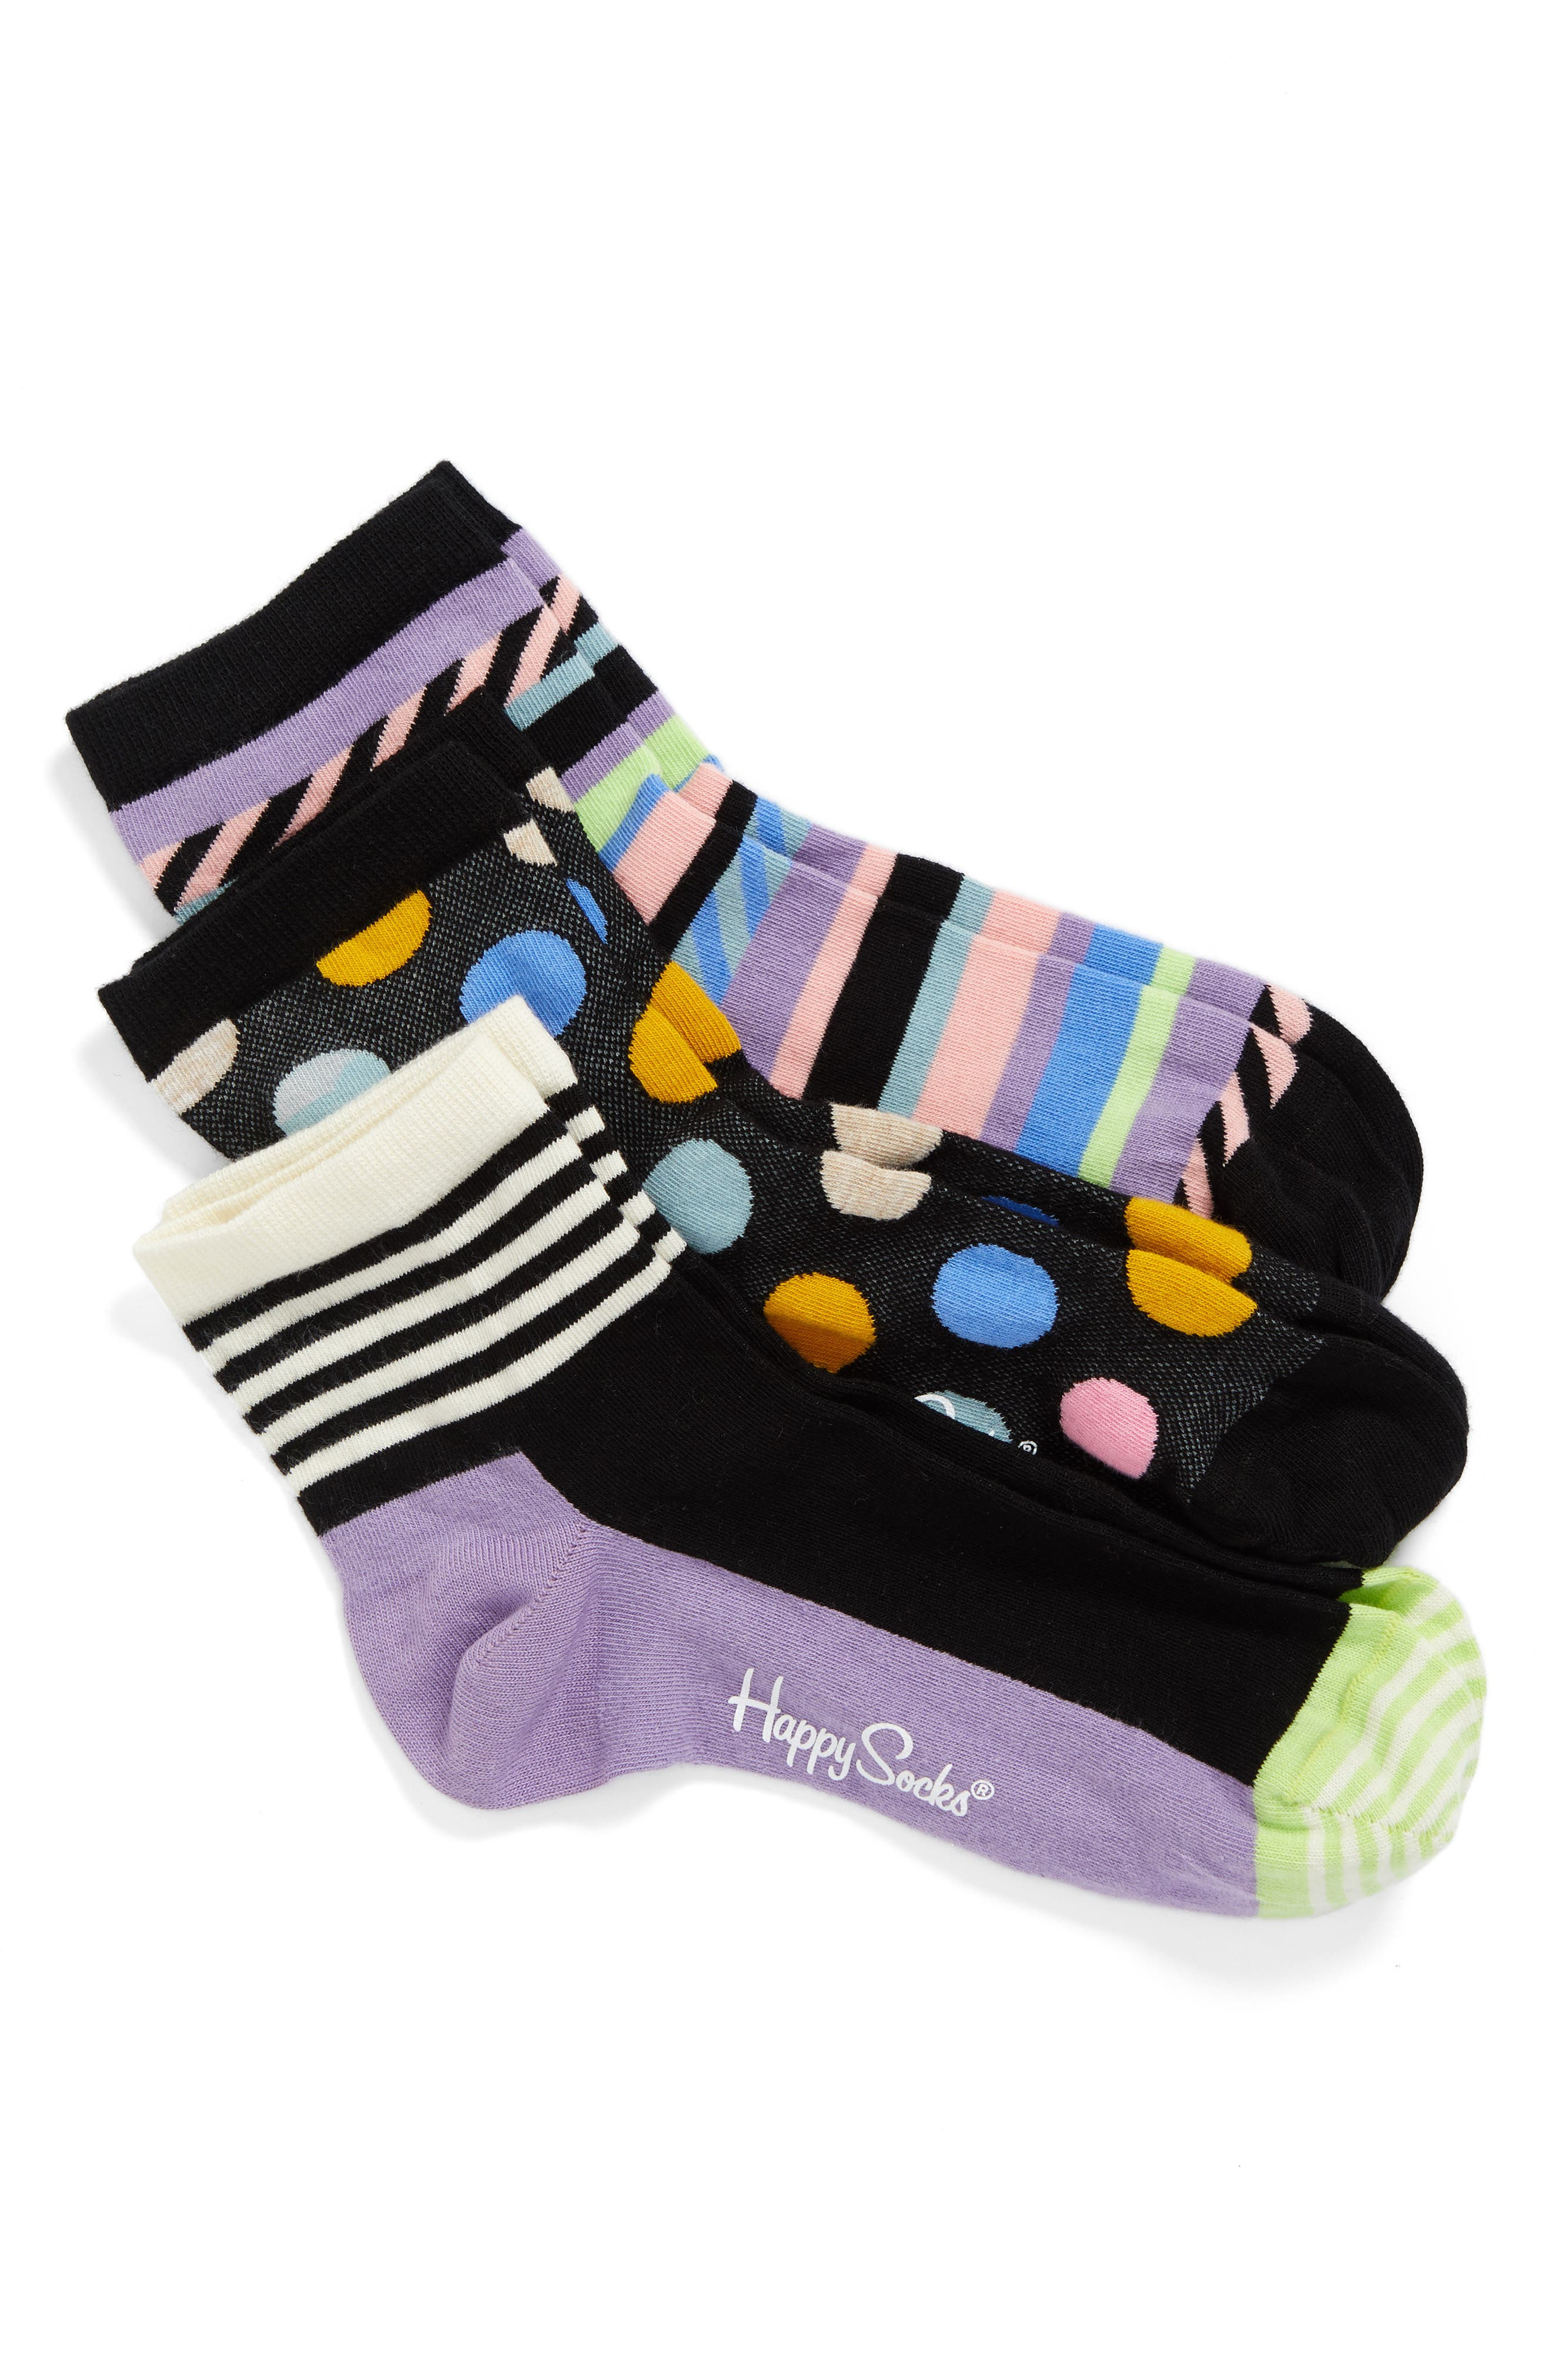 Happy Socks Assorted 3-Pack Ankle Socks